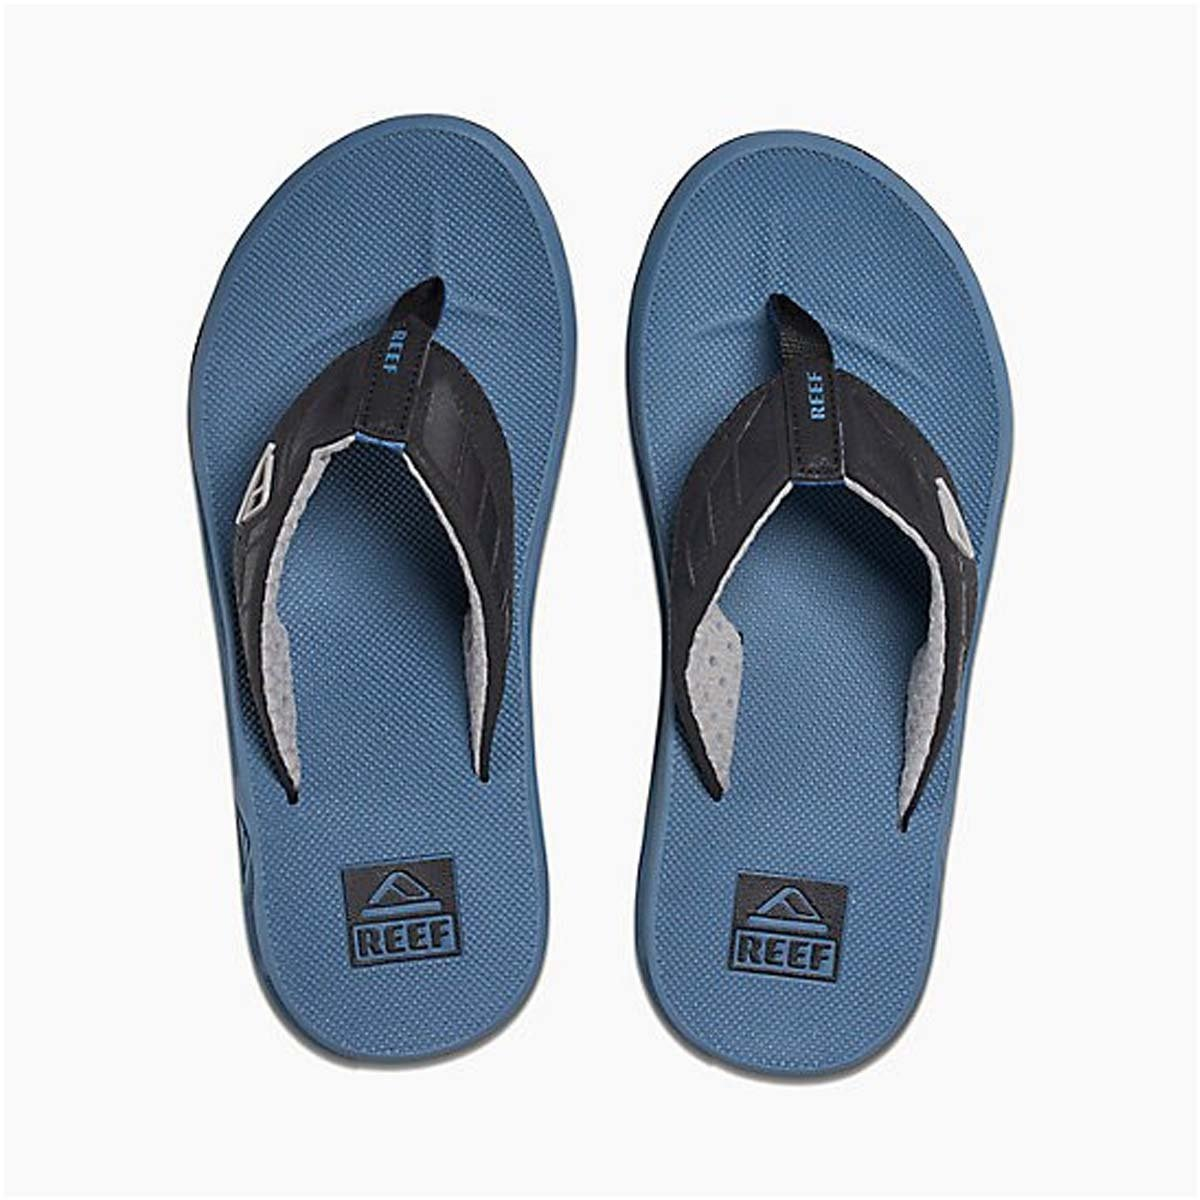 7da9b056b90492 Chinelo Reef Phantoms Steel - Azul